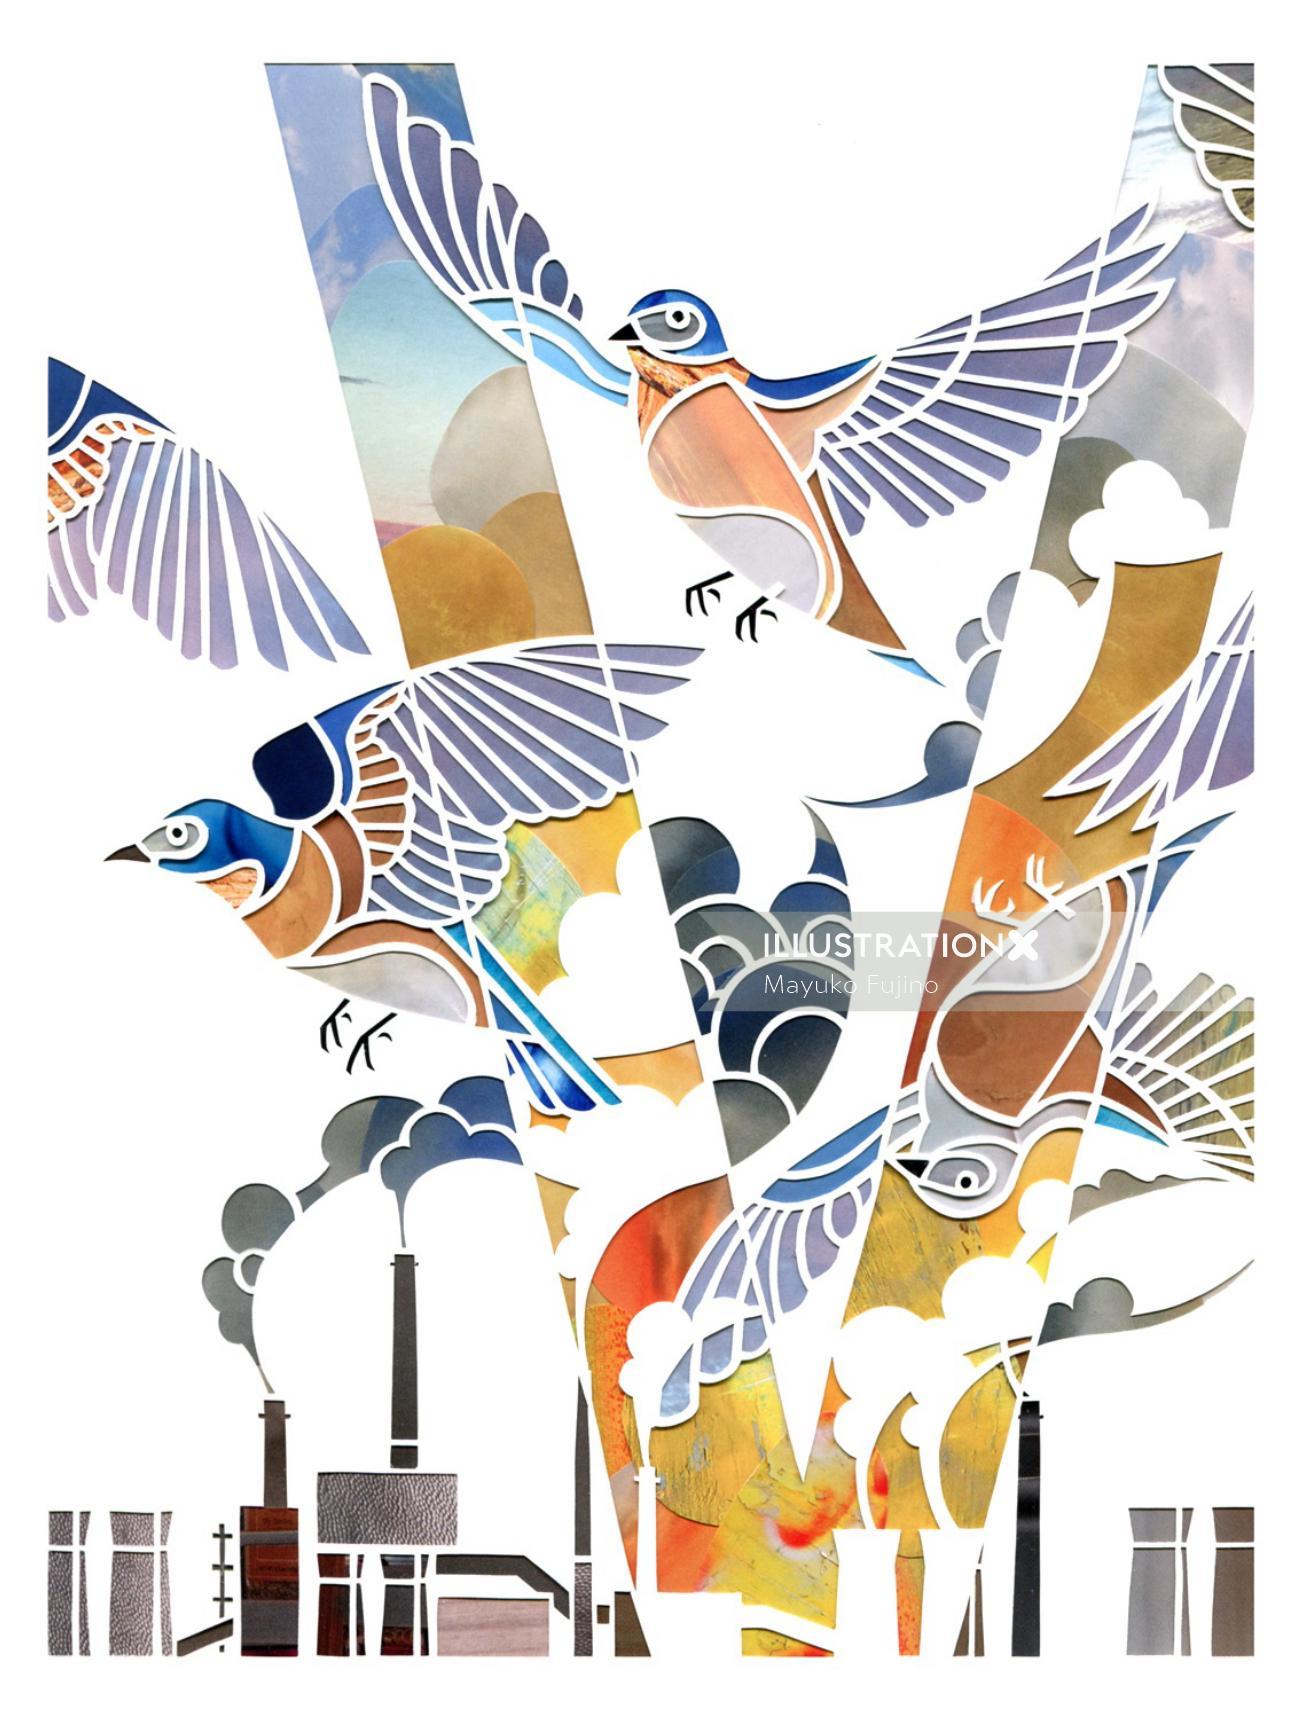 Birds flying in factories smoke illustration